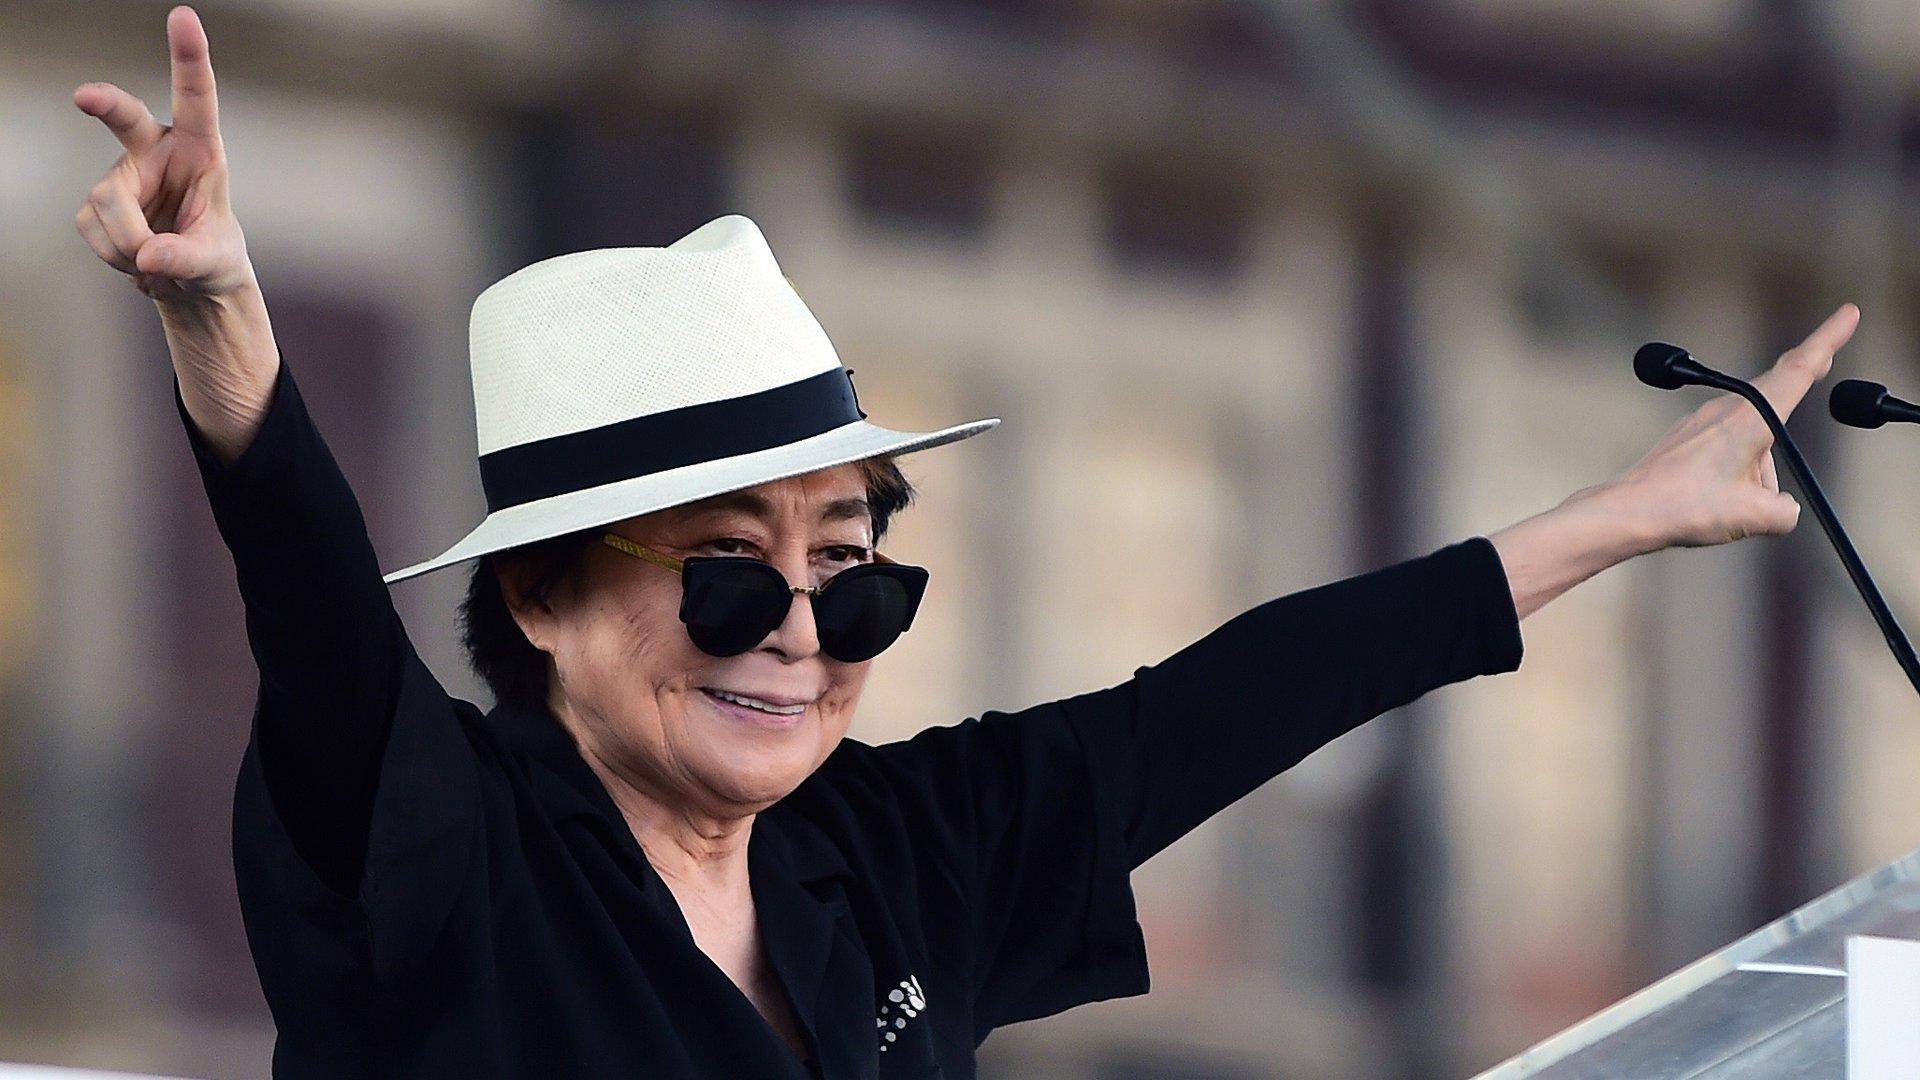 Yoko Ono Hd